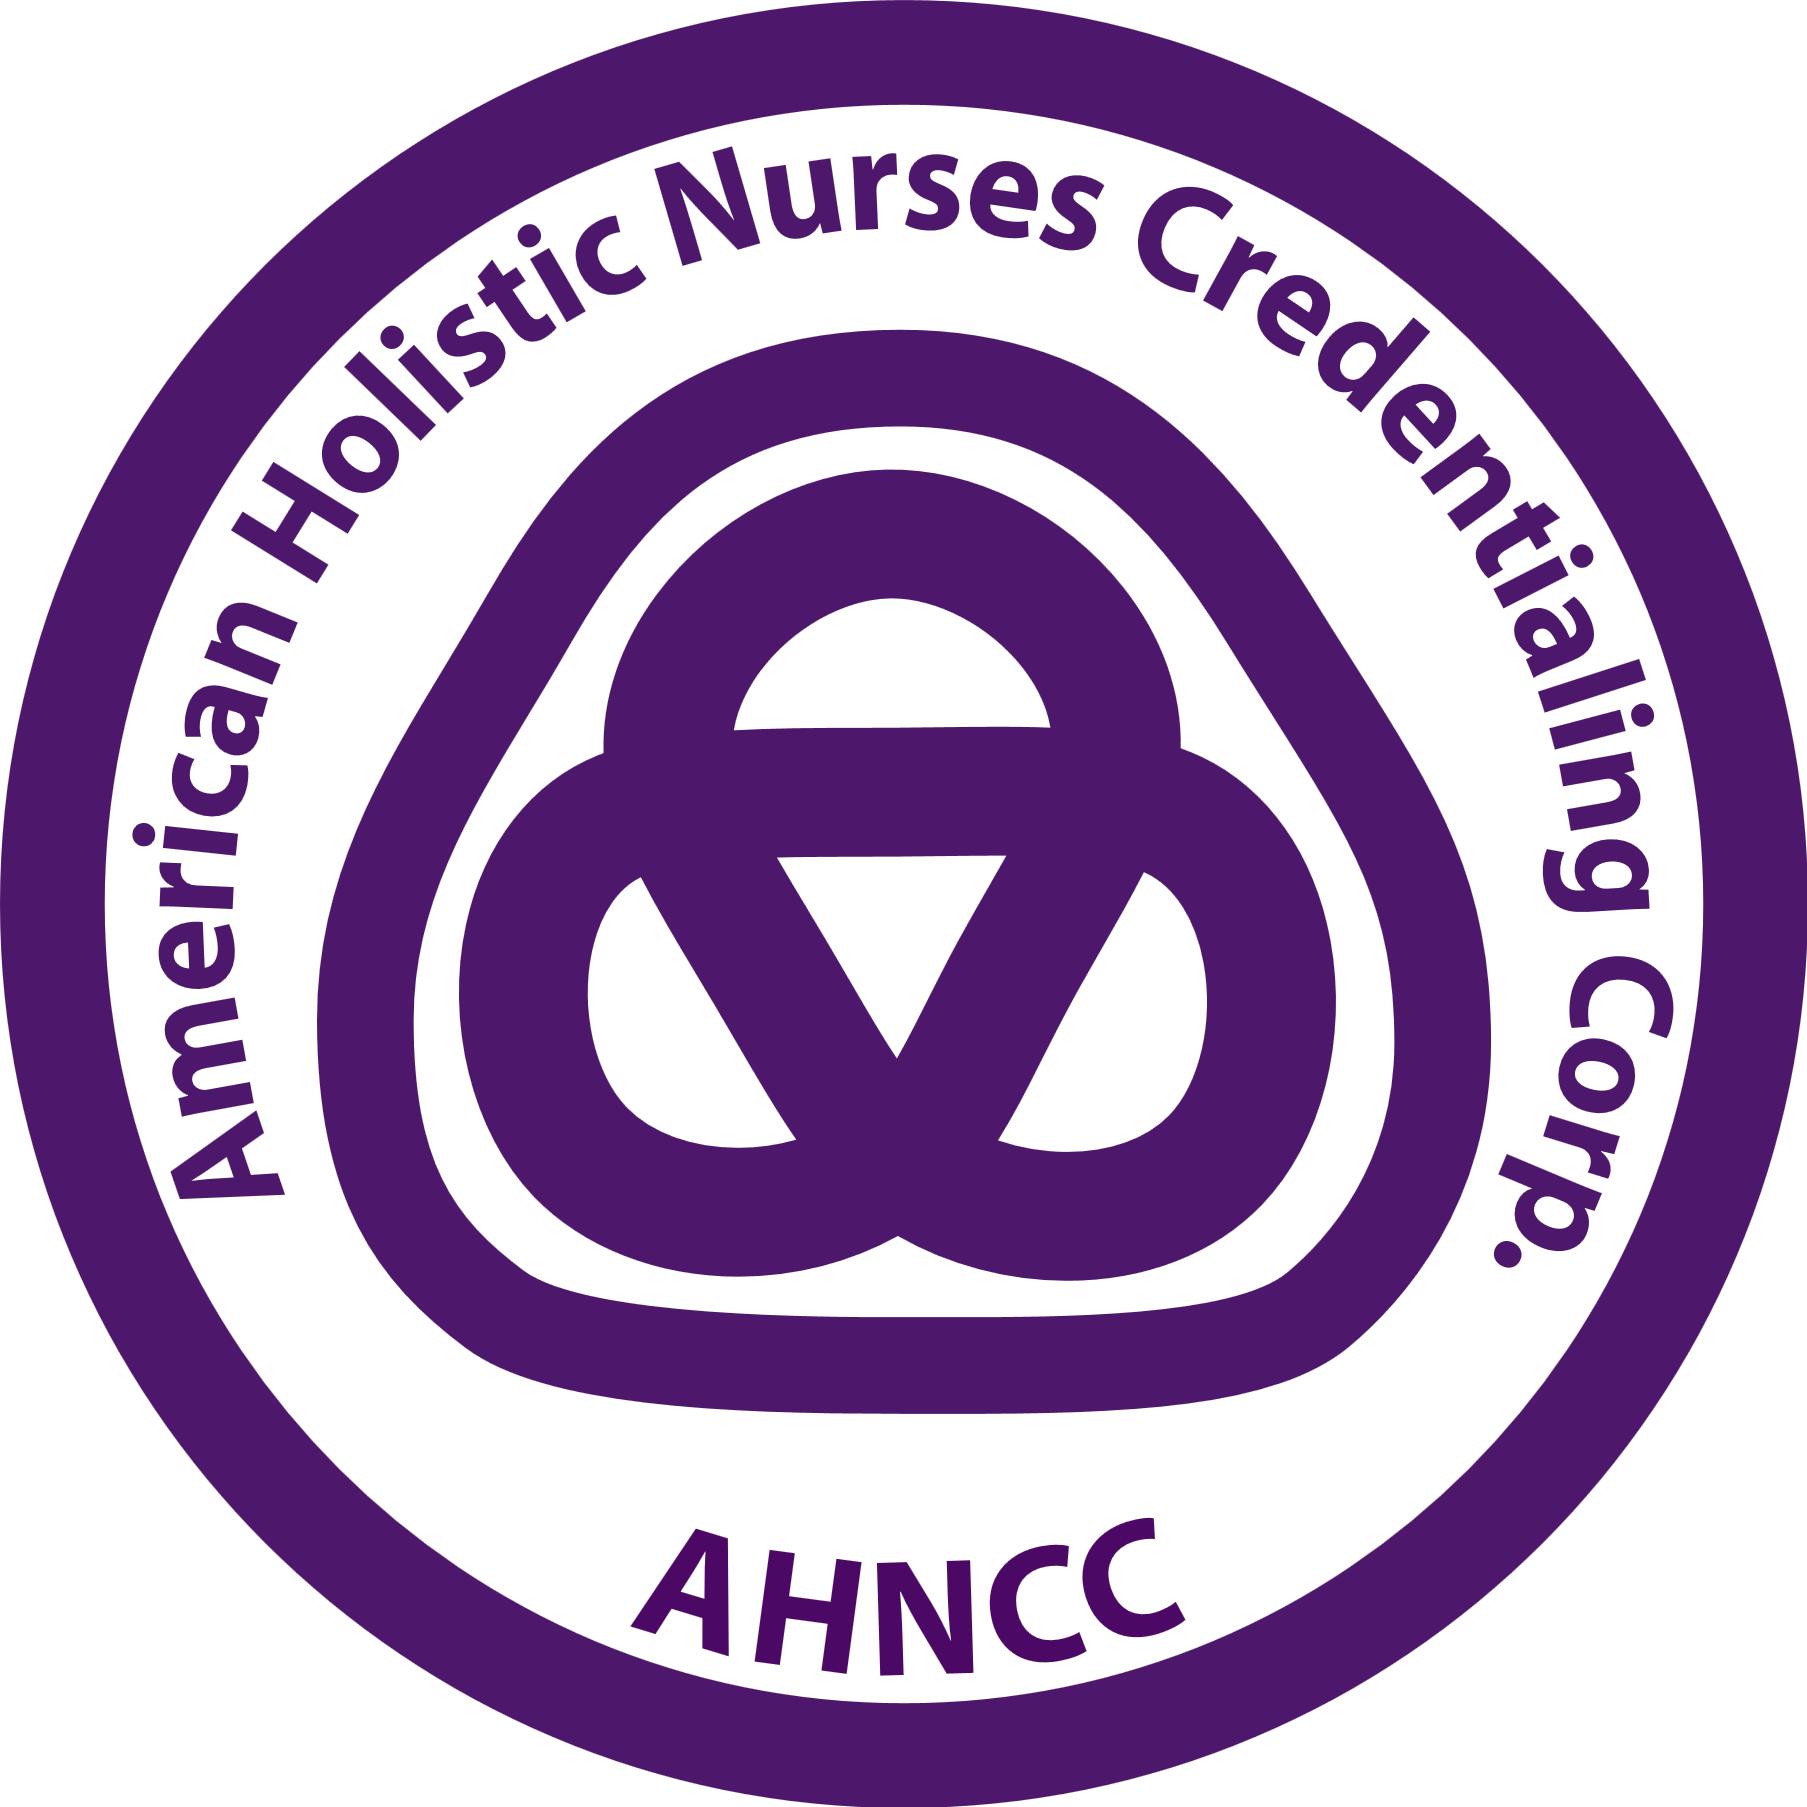 What we do nursing certifications distinguish nurses as experts in nursing practice education and research certifications in holistic nursing and nurse coaching are xflitez Choice Image